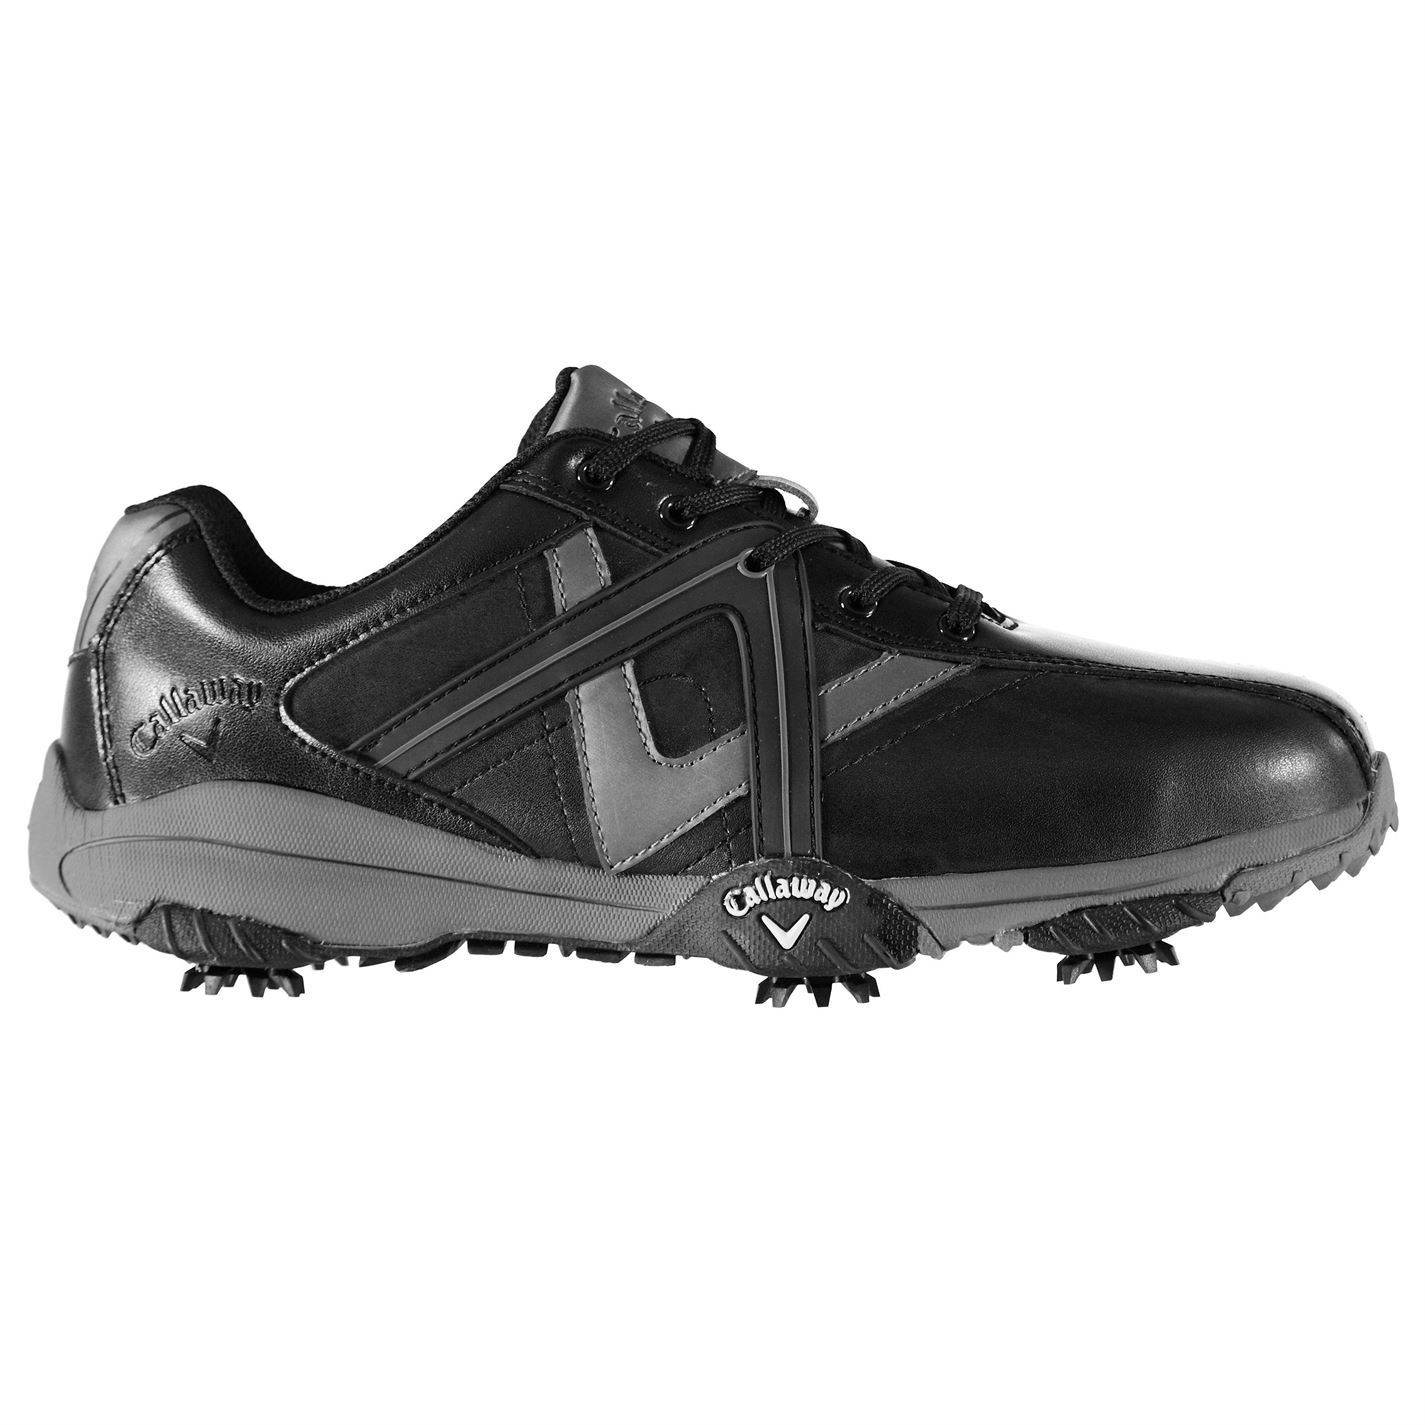 Callaway-Cheviot-ll-Golf-Shoes-Mens-Spikes-Footwear thumbnail 6